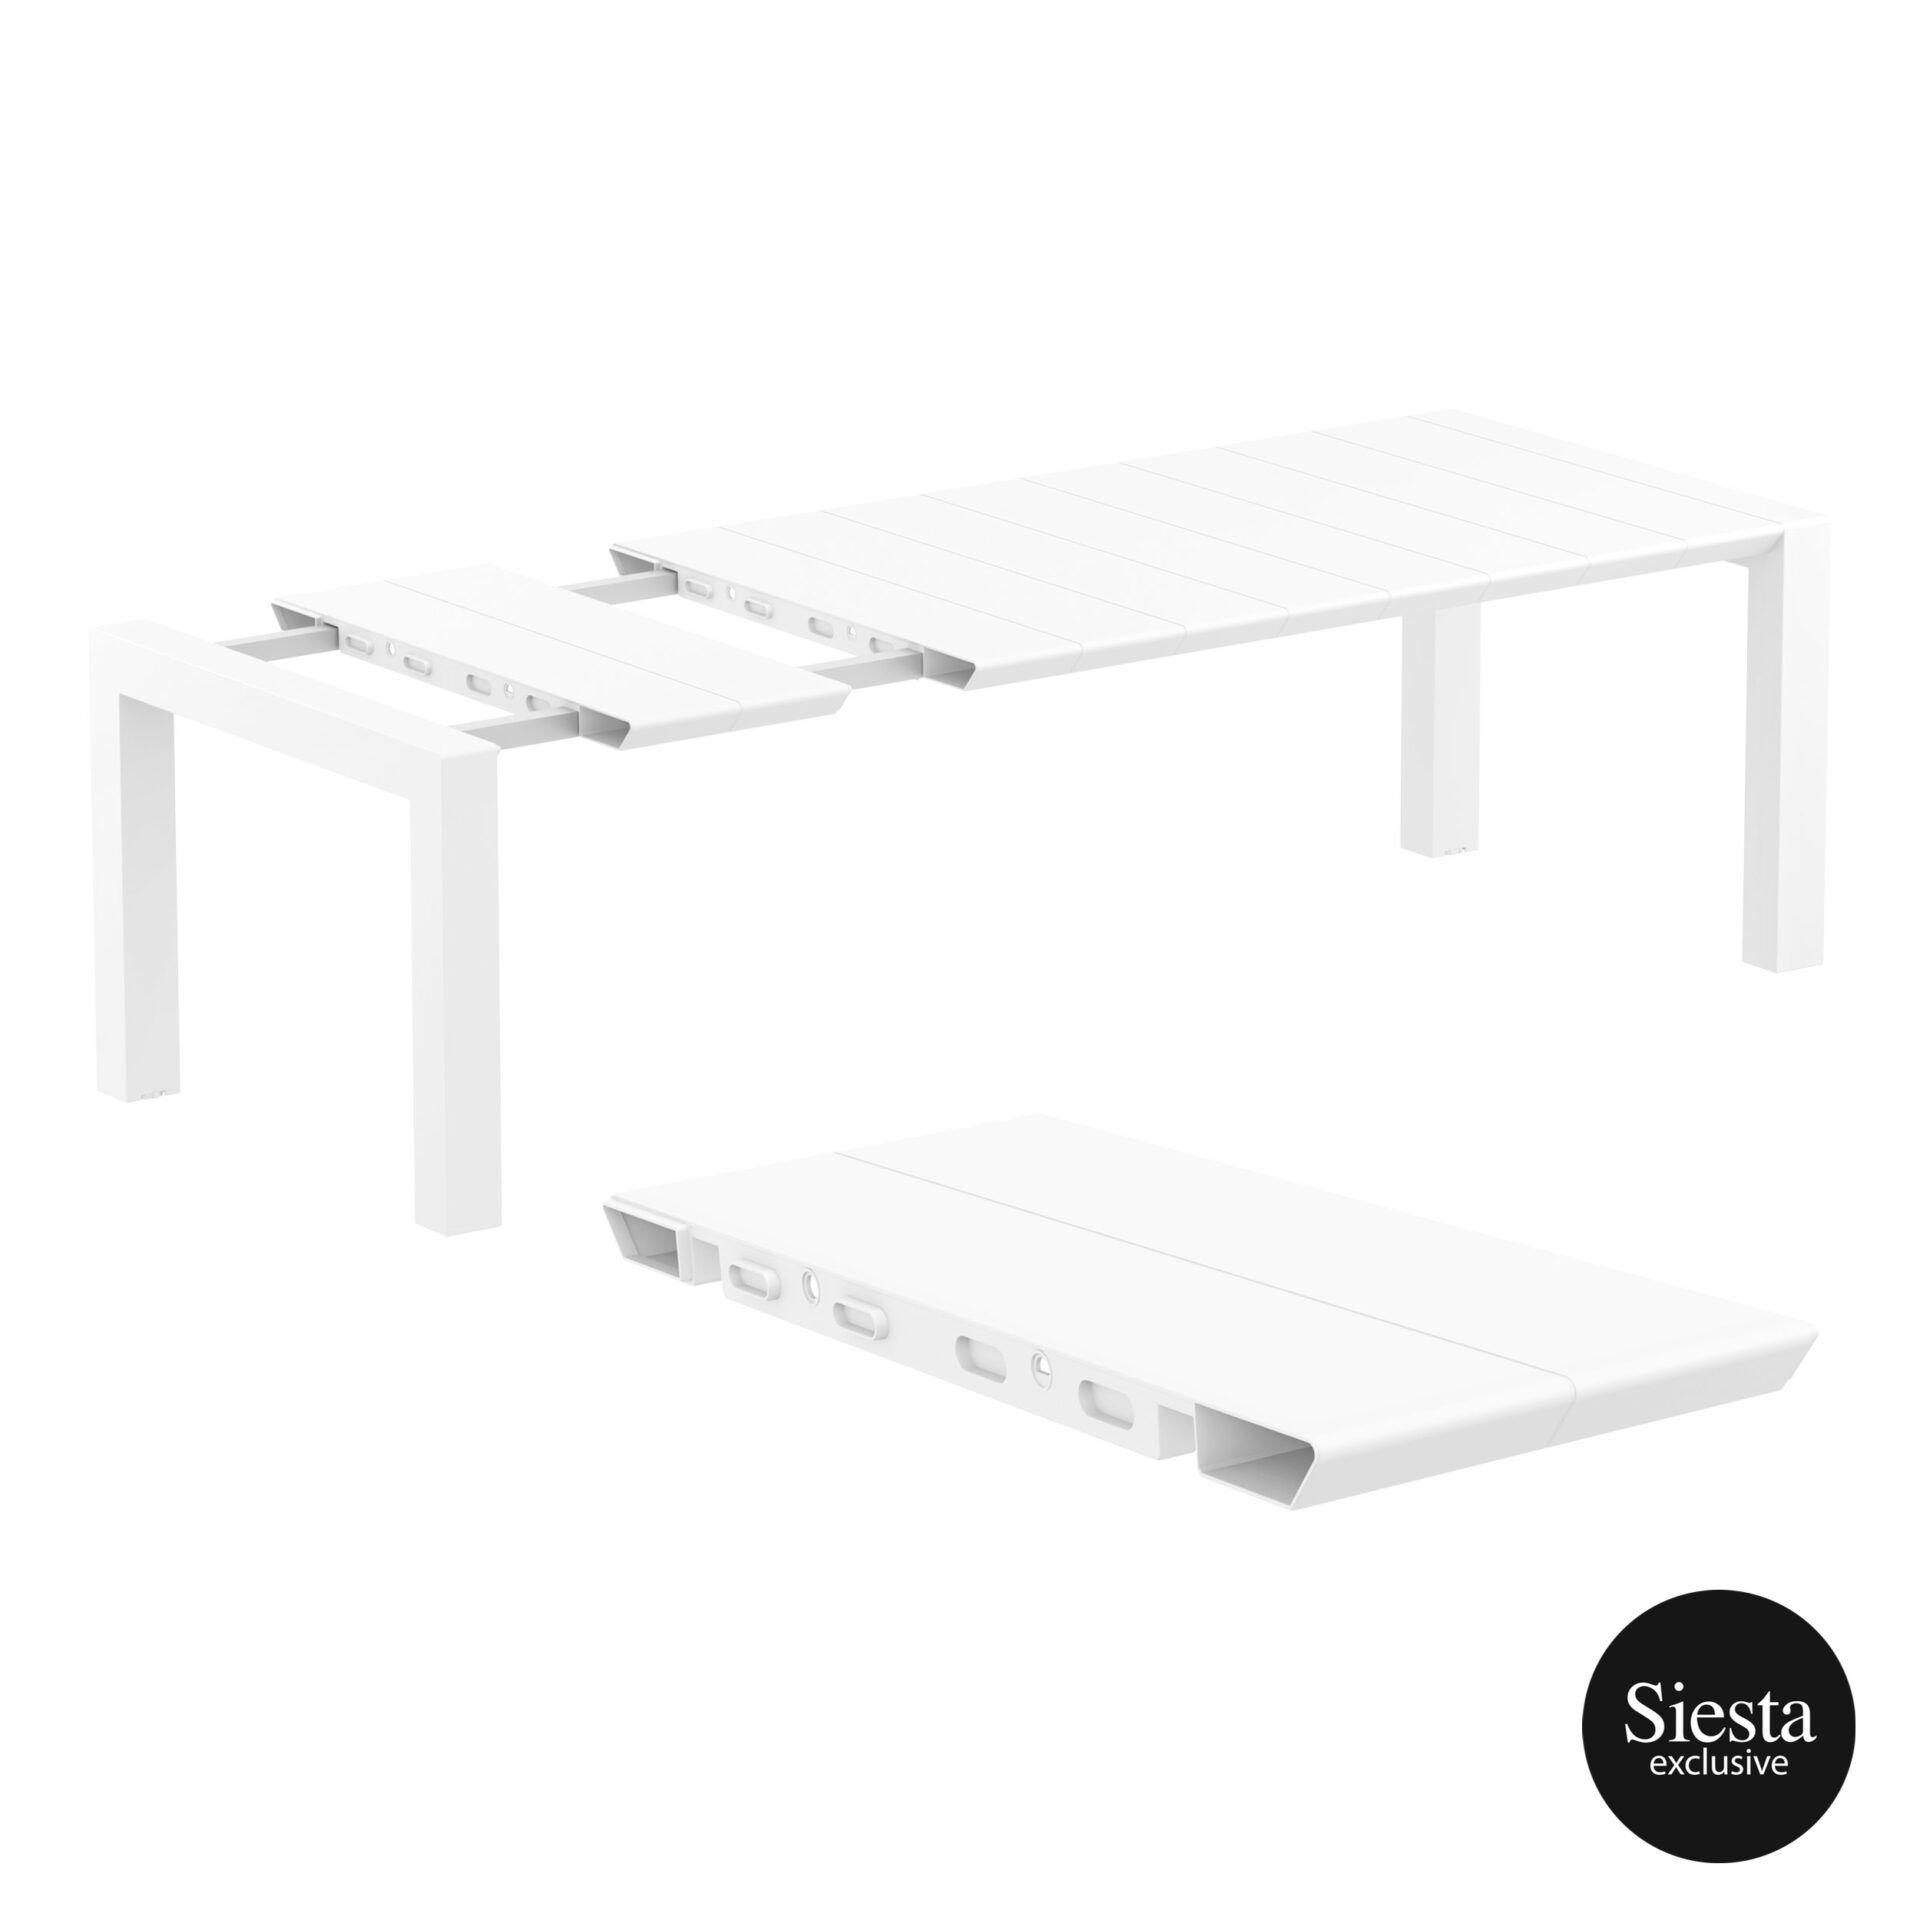 013 vegas table medium 220 white extension part 1